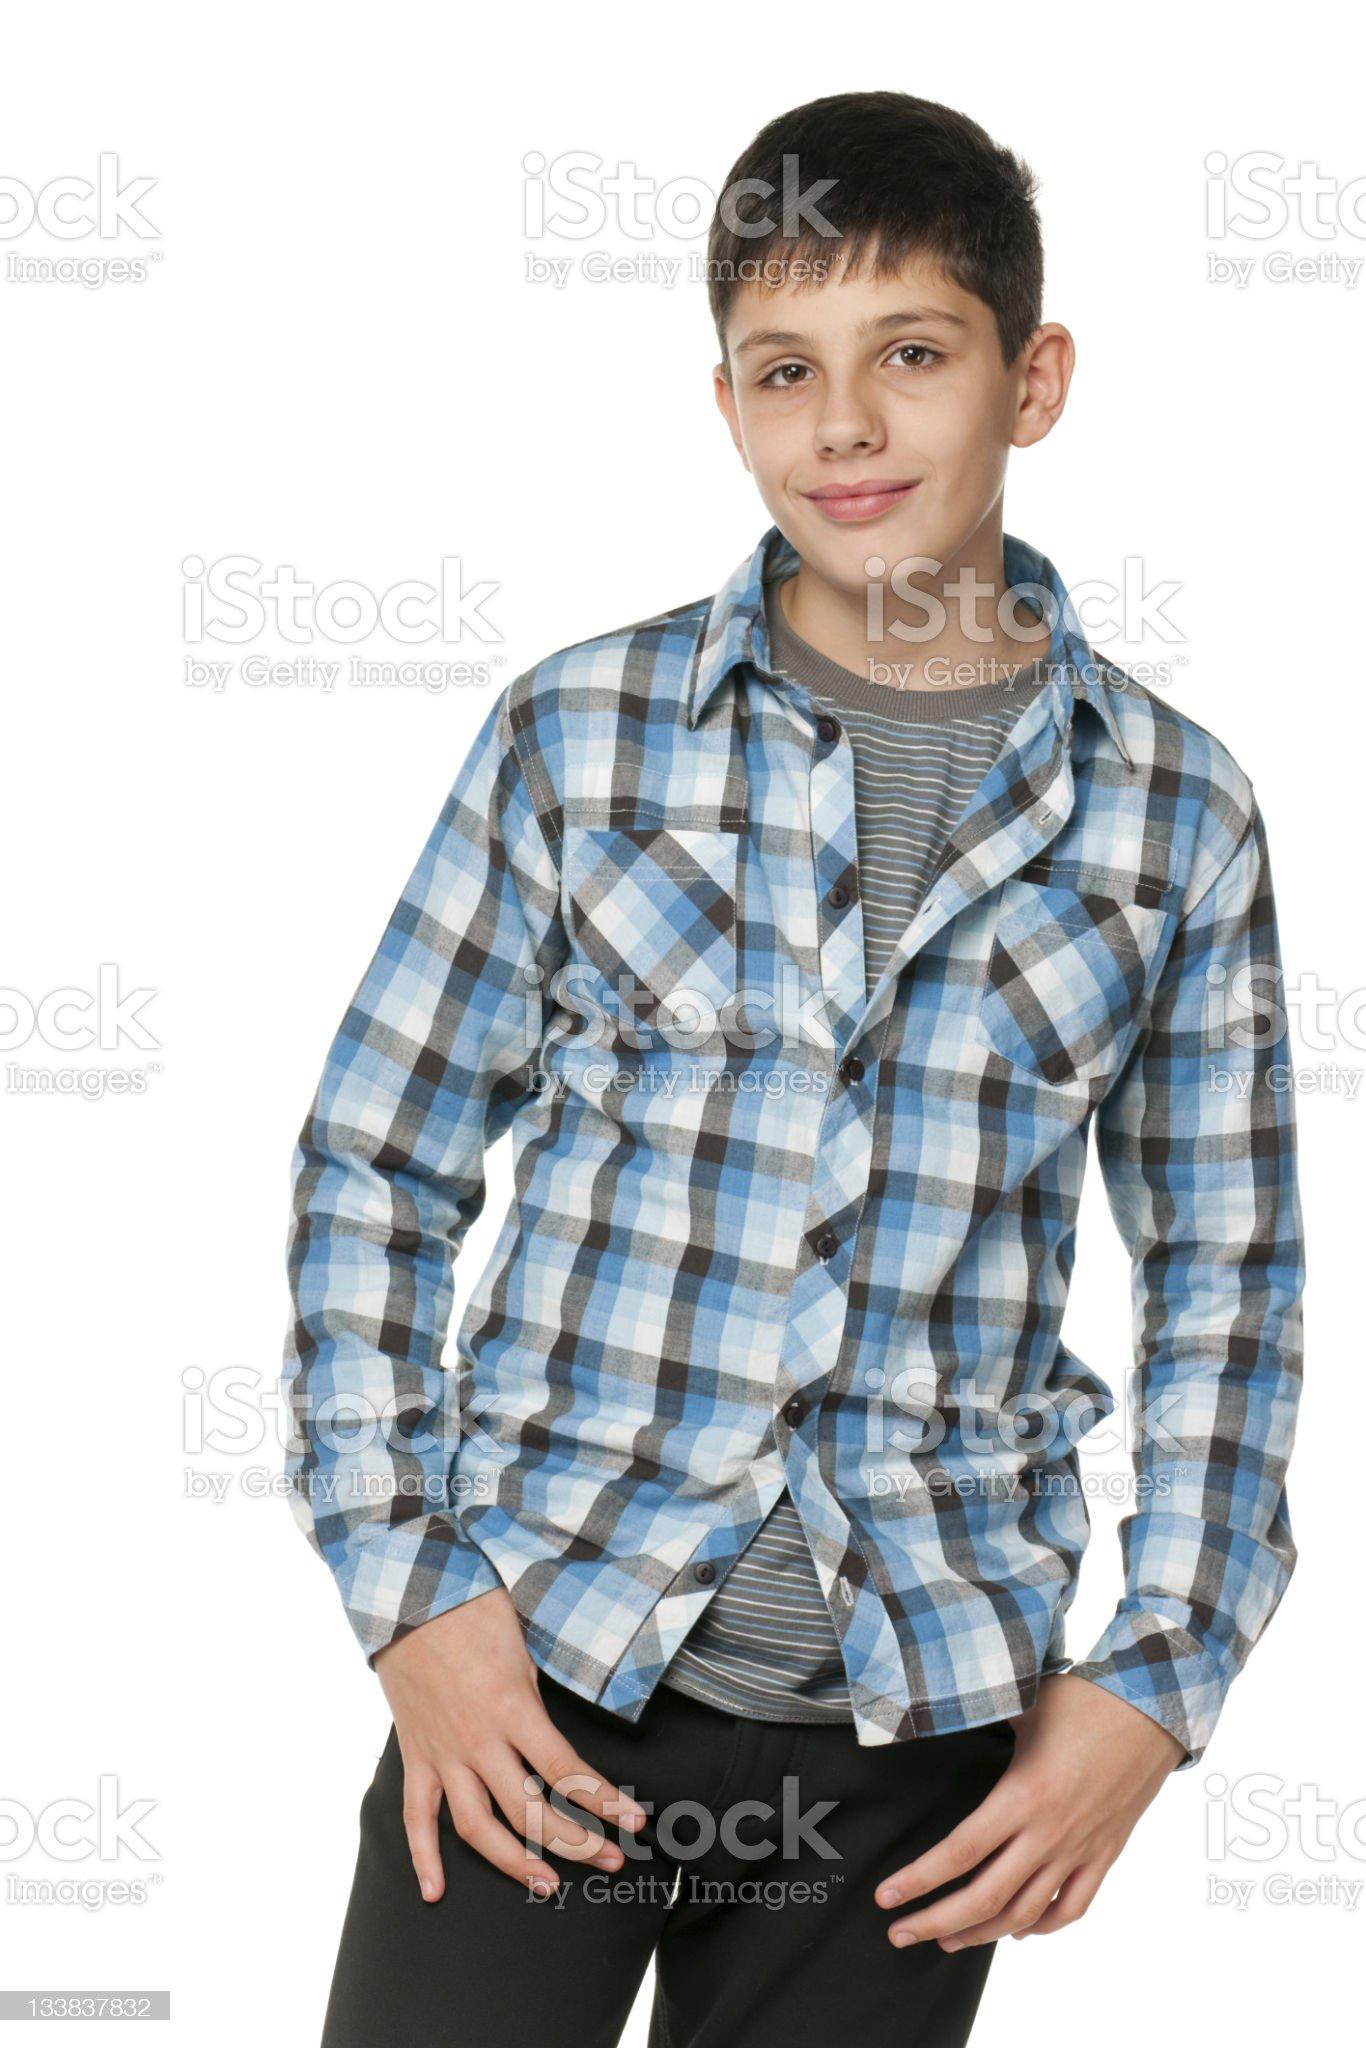 Fashion smiling teen royalty-free stock photo